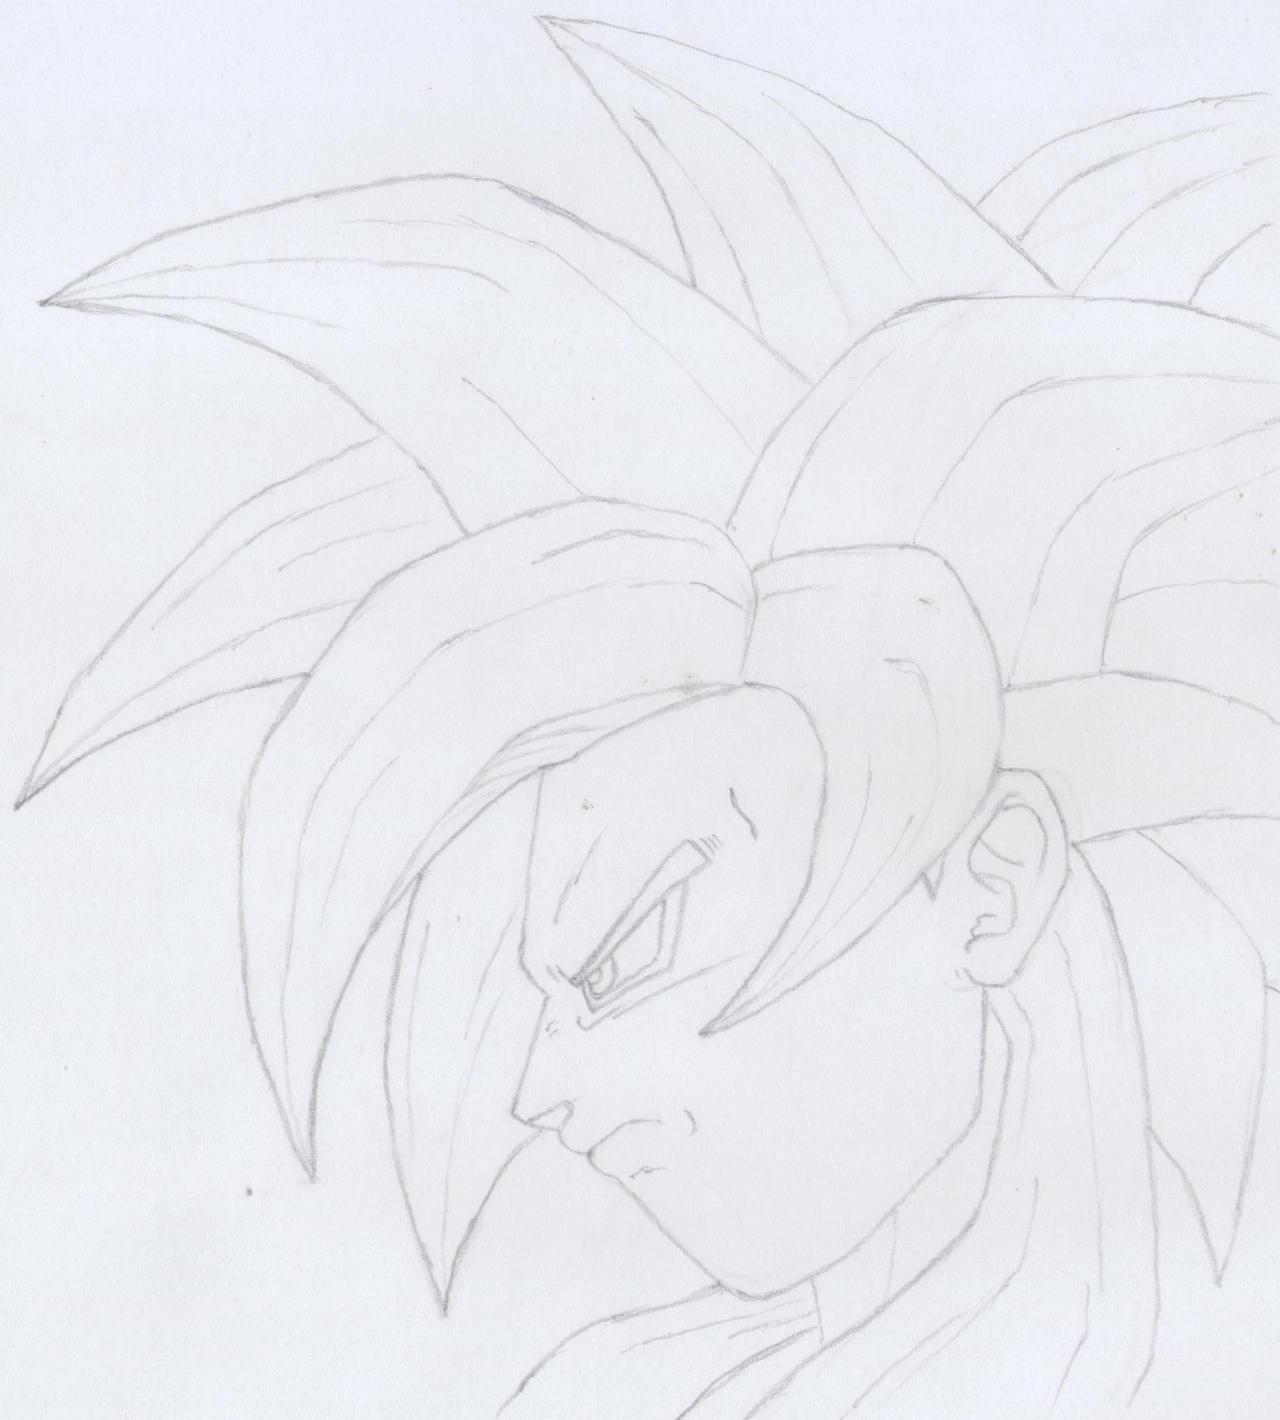 SSJ4 Goku pencil sketch